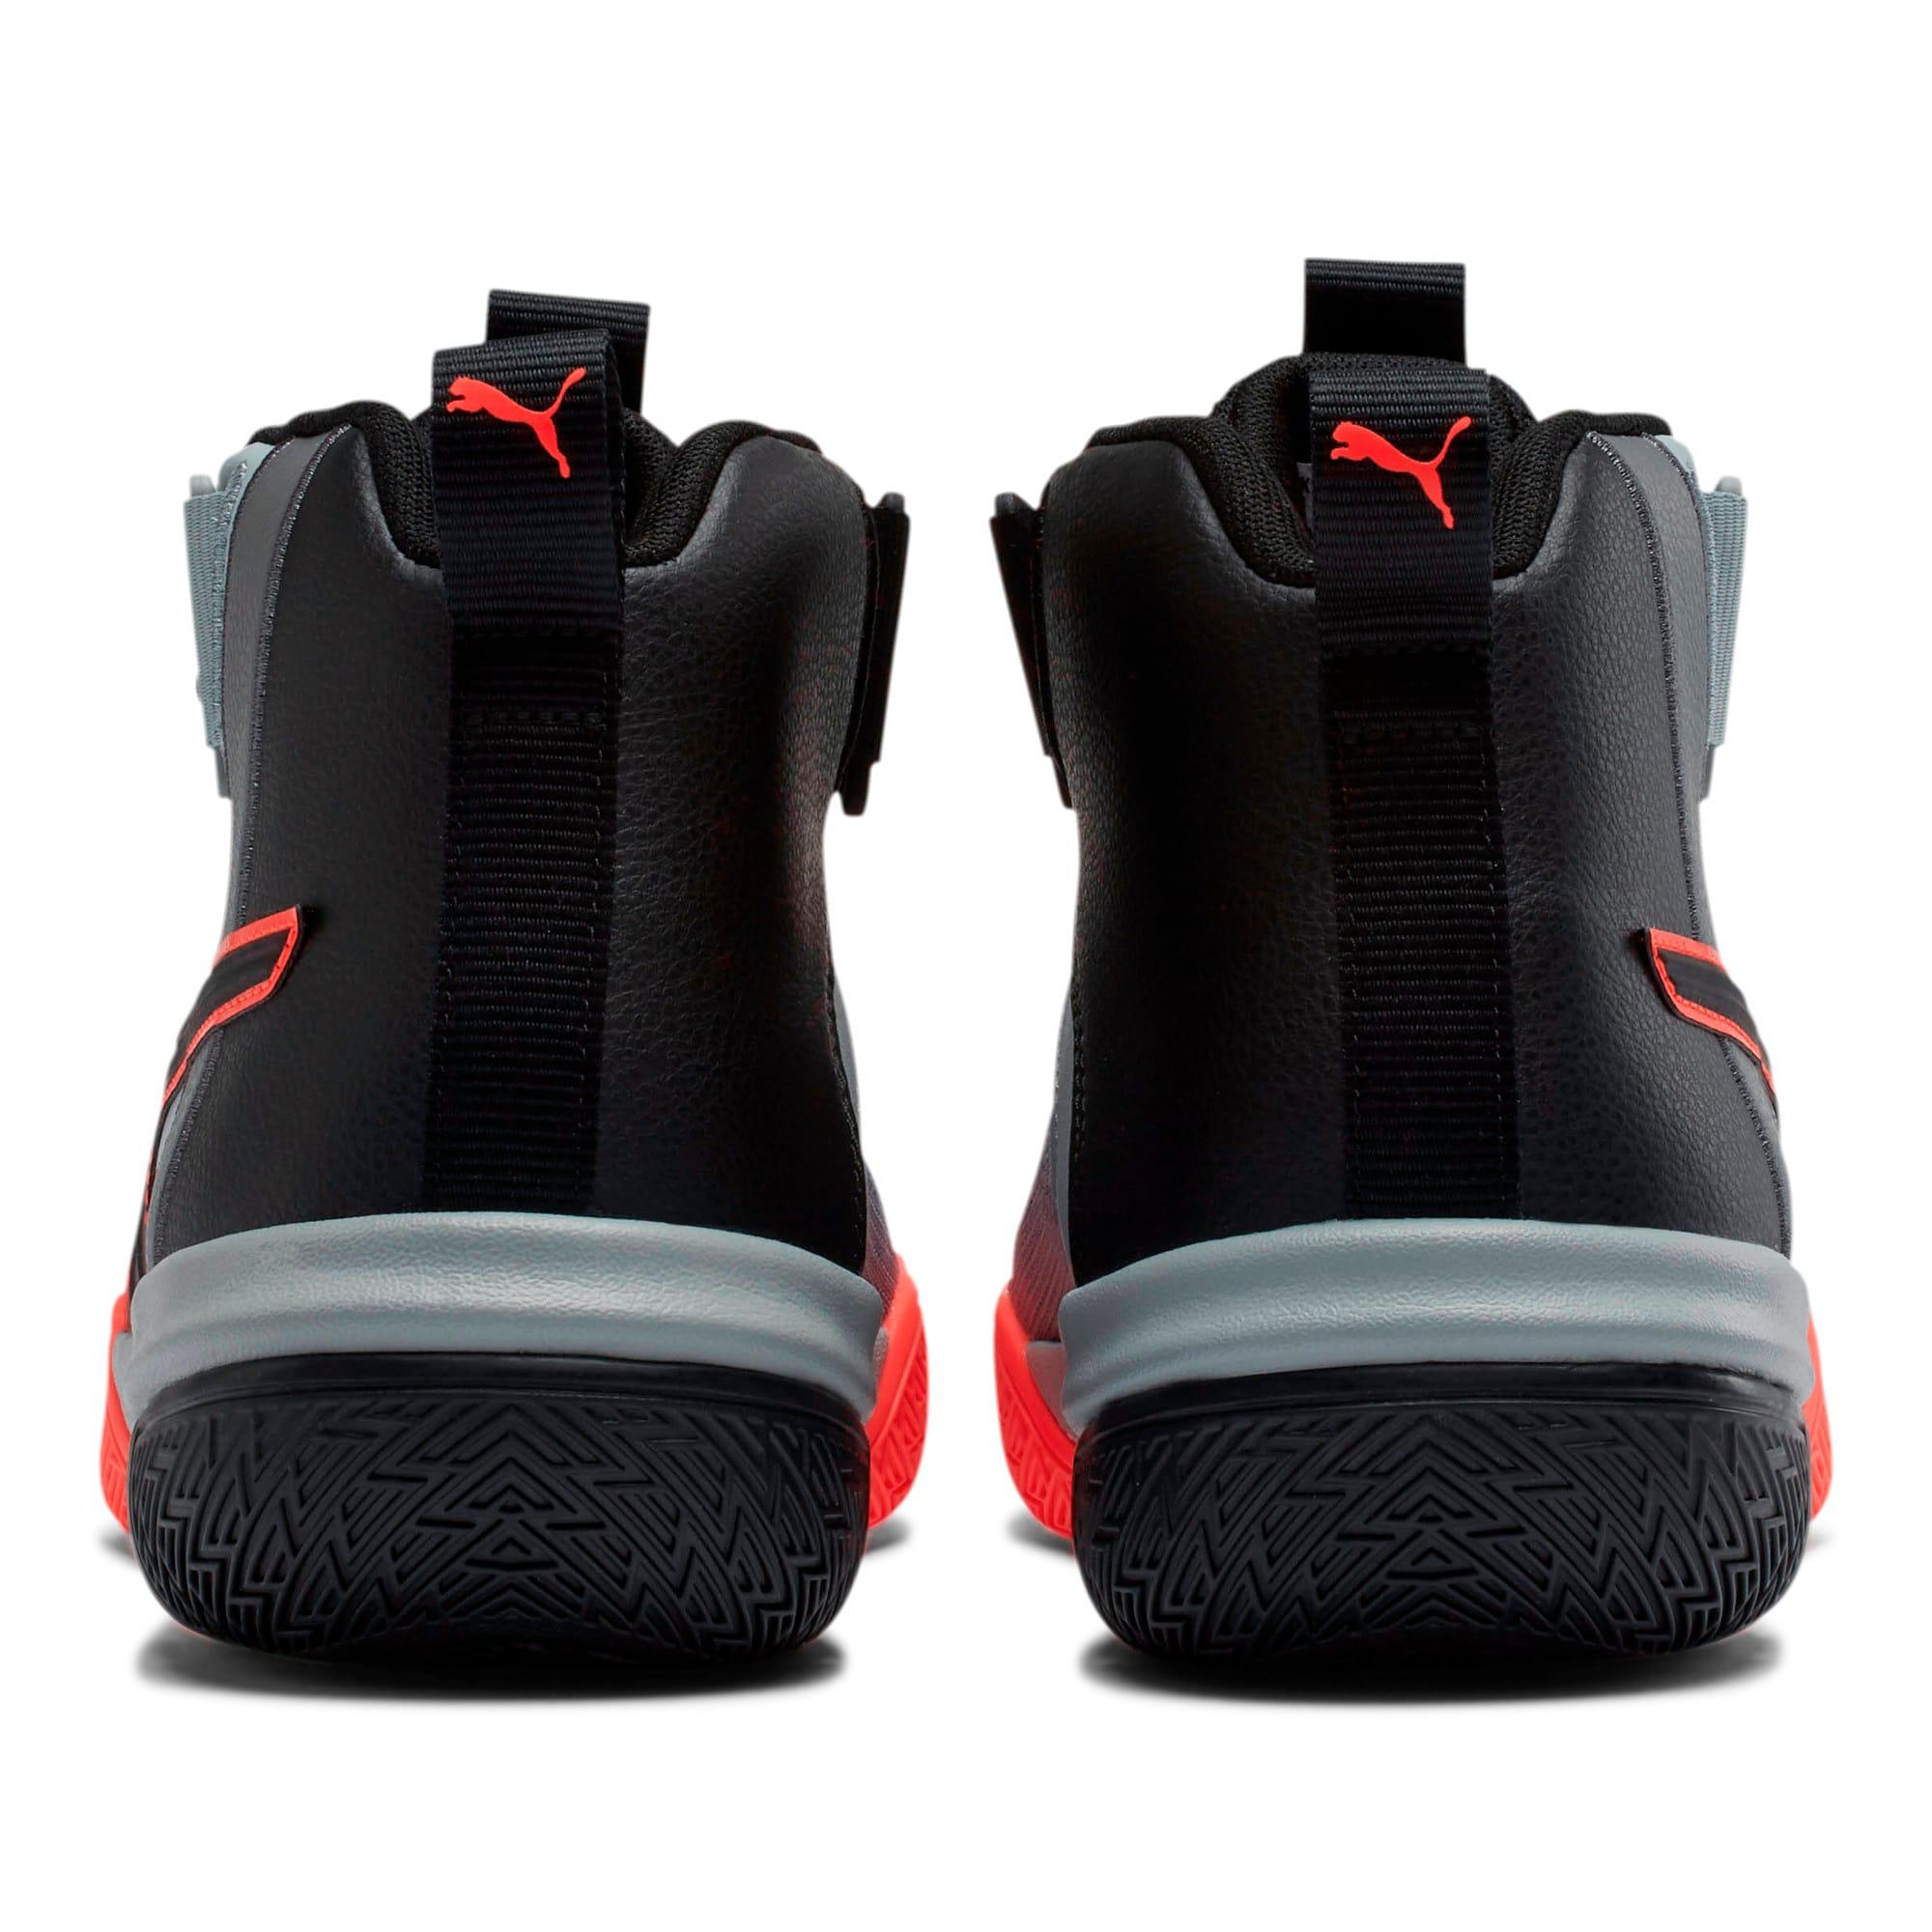 Thumbnail 3 of Legacy Disrupt Basketball Shoes, Puma Black-Red Blast, medium